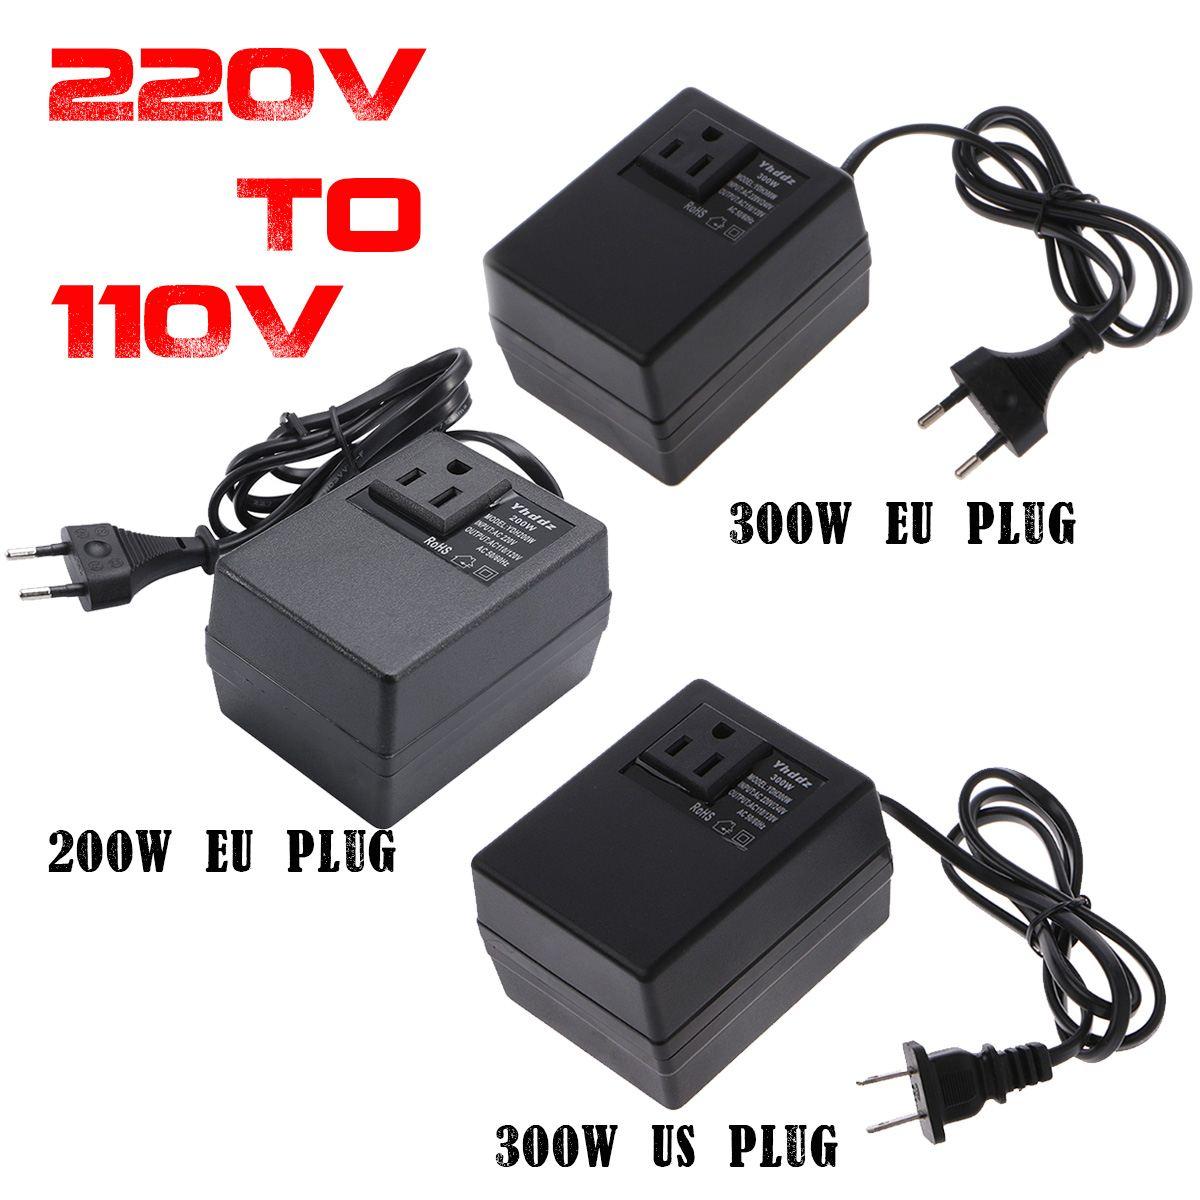 200W/300W Spannung Konverter Transformator 220V Bis 110V Step Down Reise Spannung Transformator Konverter EU/UNS Stecker